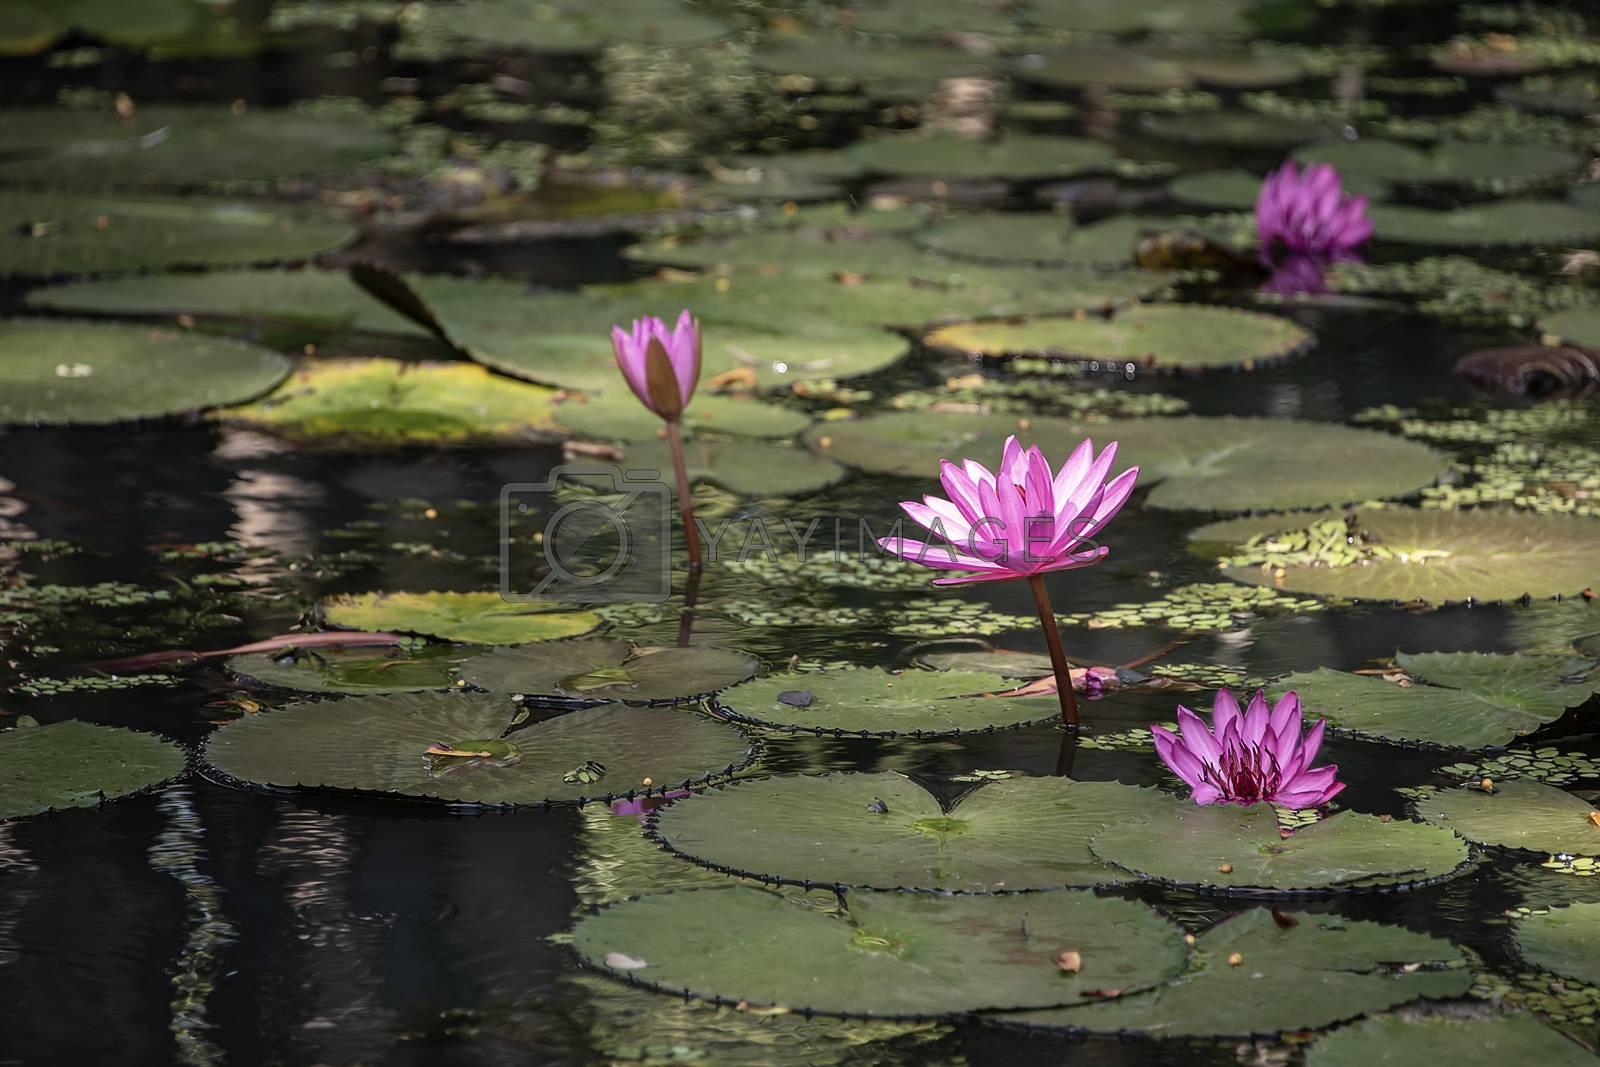 Sir Lanka, Sigyriya: Lotus flower blooming in a reflective pool